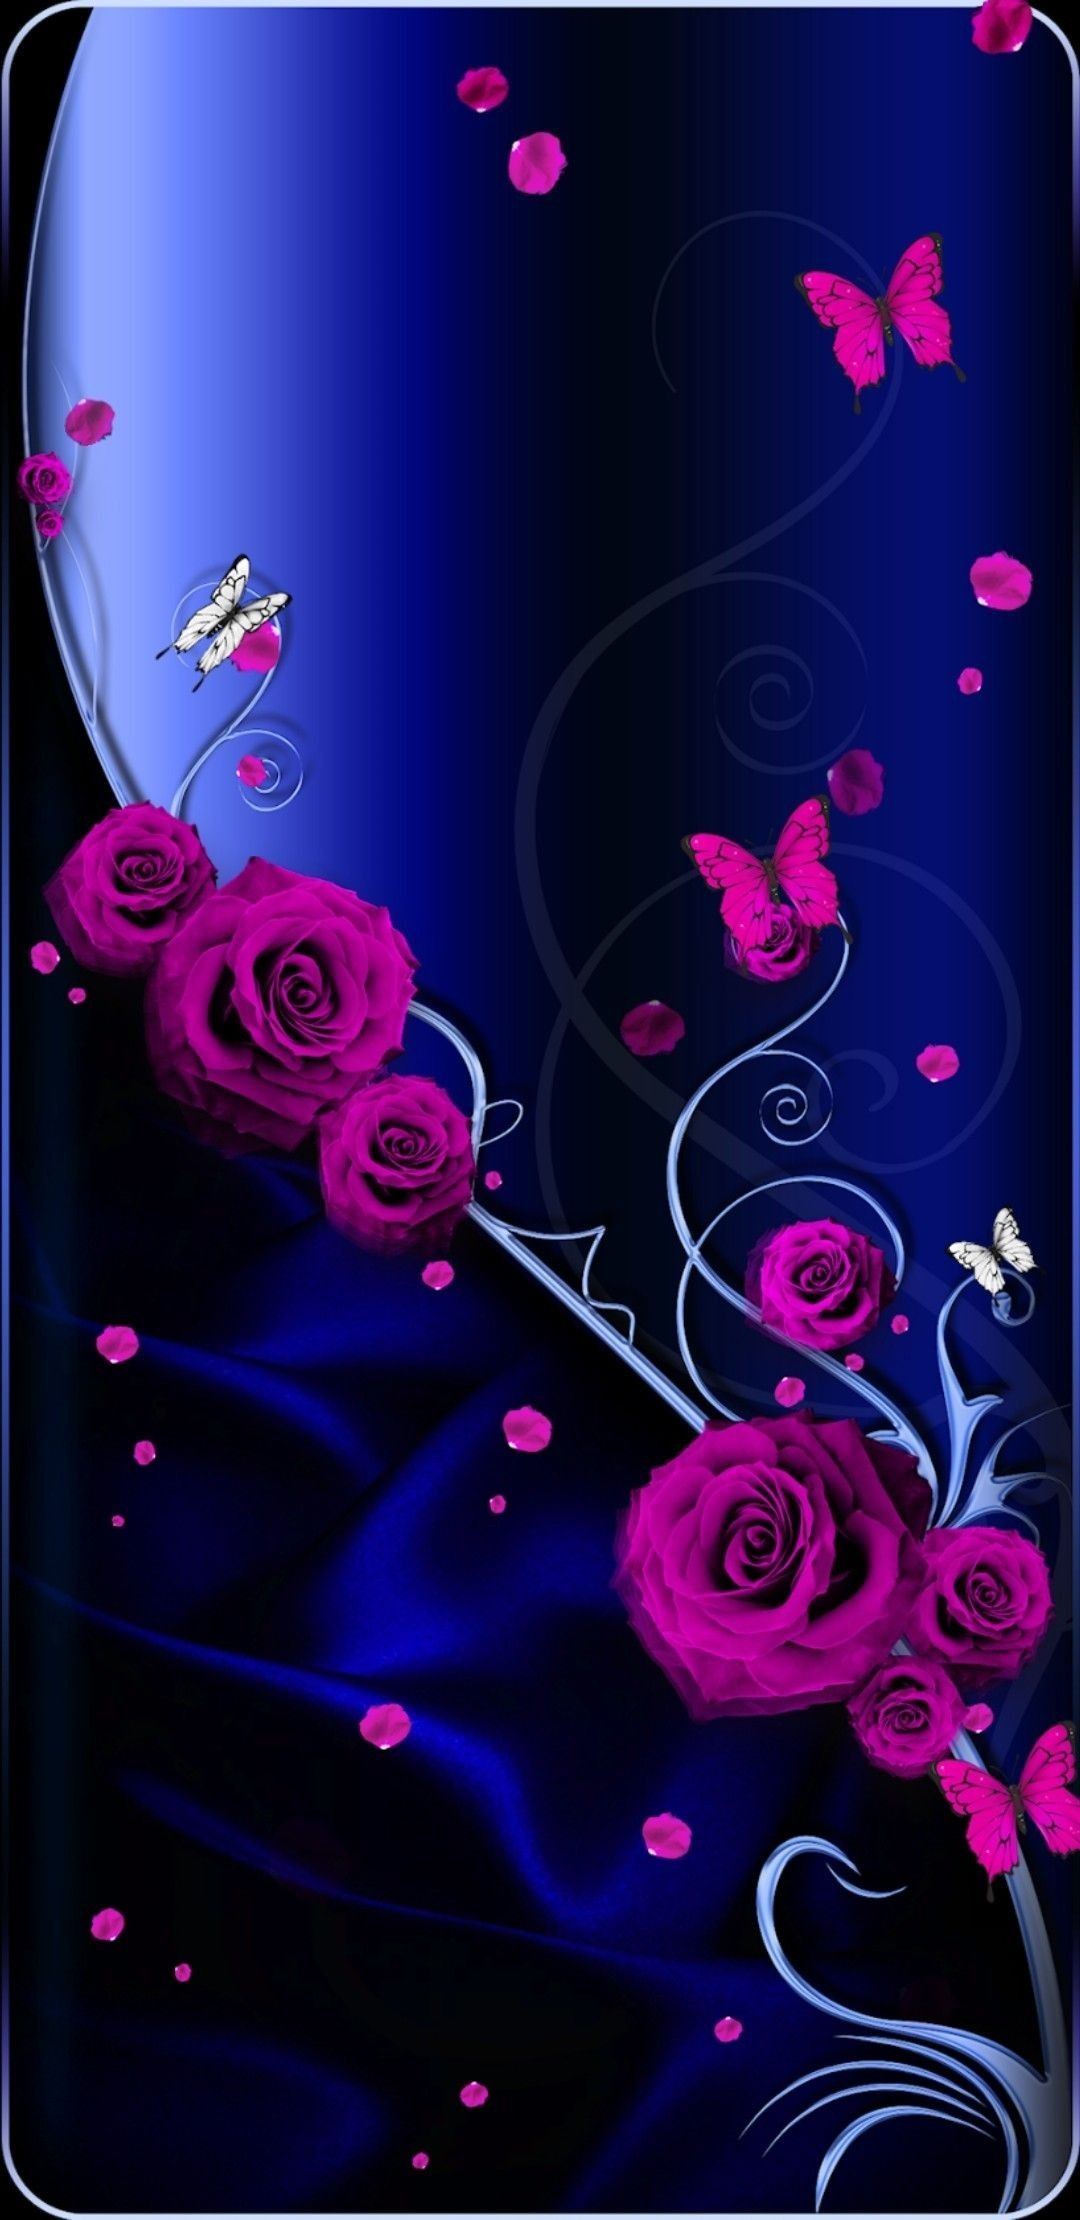 Pin By Olik On Variados Dreamcatcher Wallpaper Flower Wallpaper Rose Flower Wallpaper